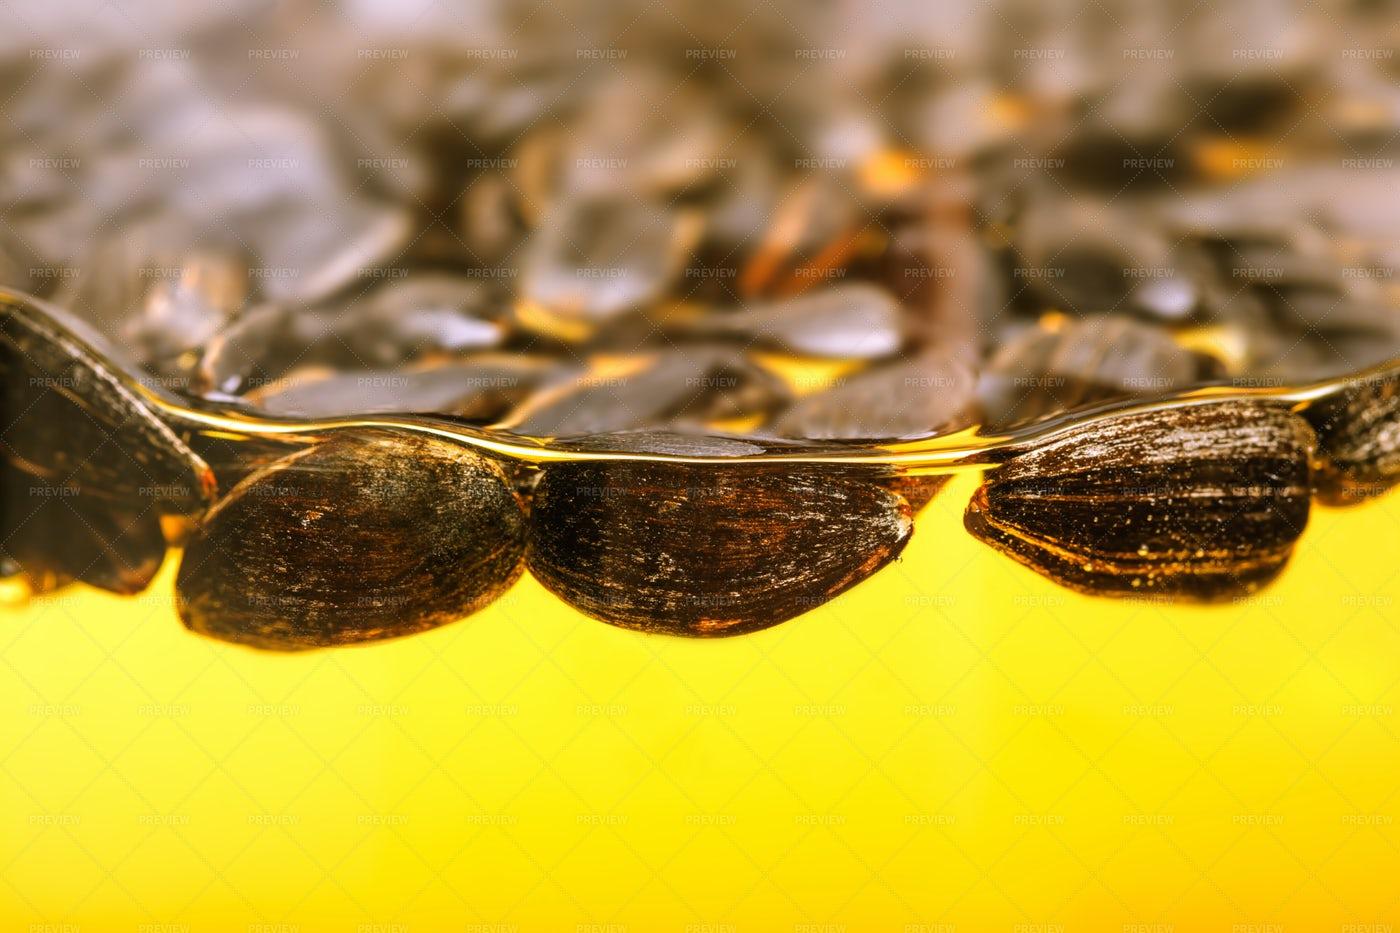 Sunflower Seeds In Oil: Stock Photos